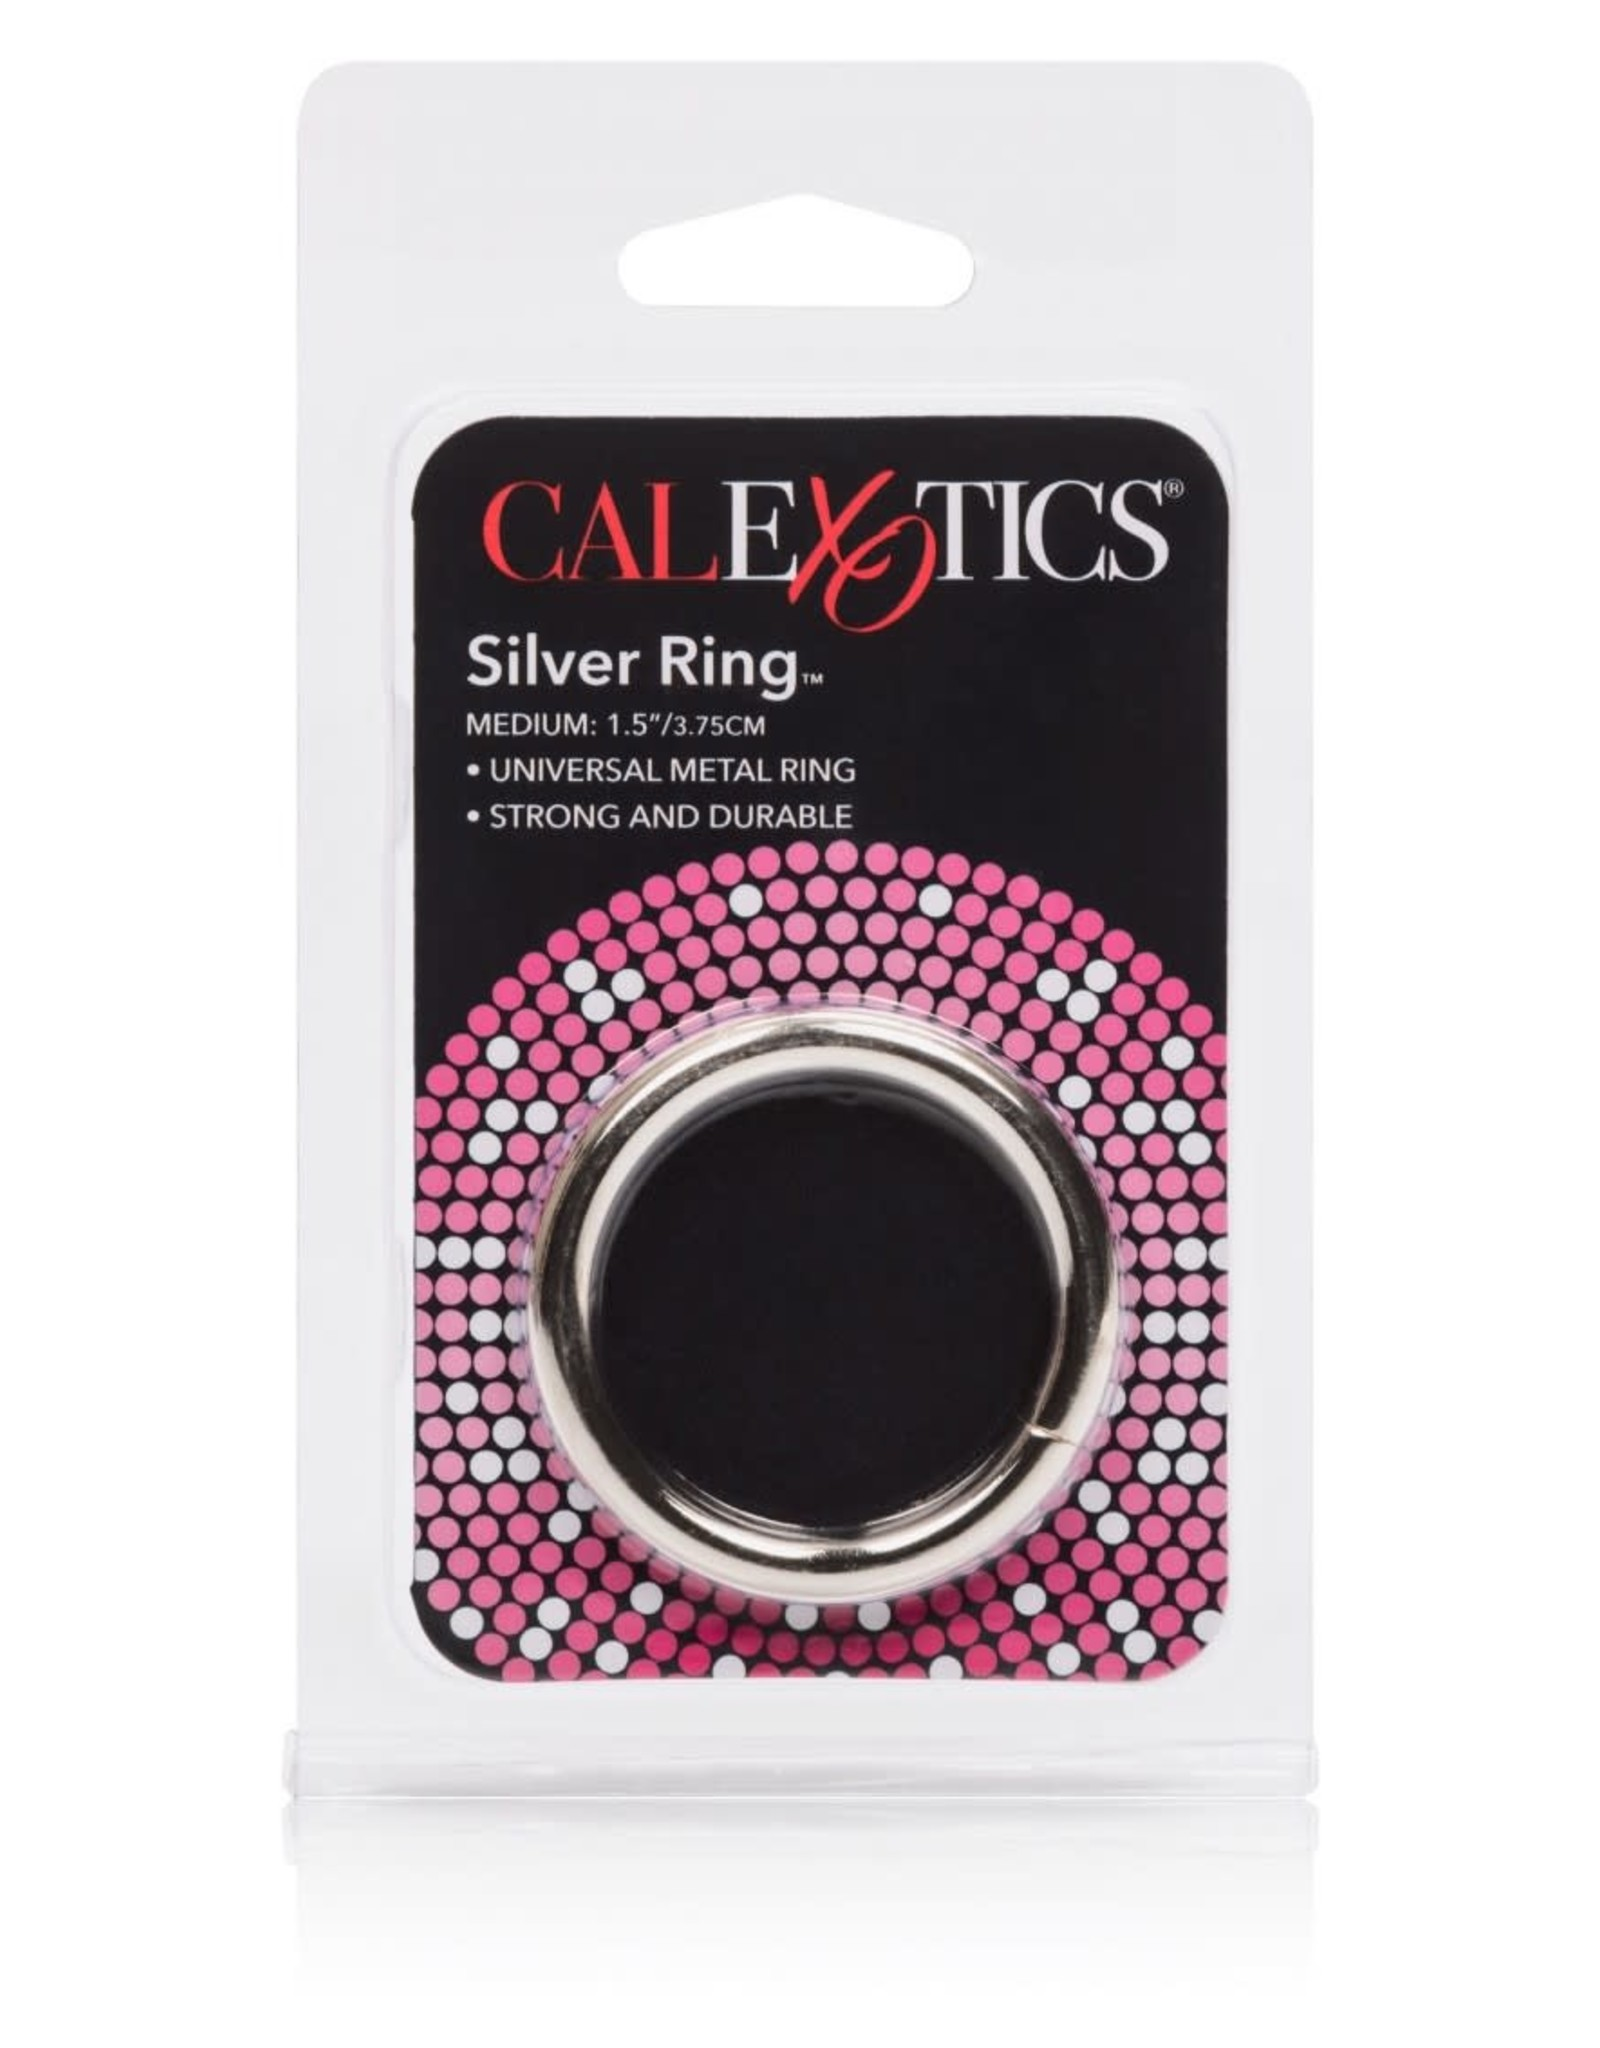 "CALEXOTICS - ALLOY METALLIC RING - MEDIUM 1.5""X3.75CM"